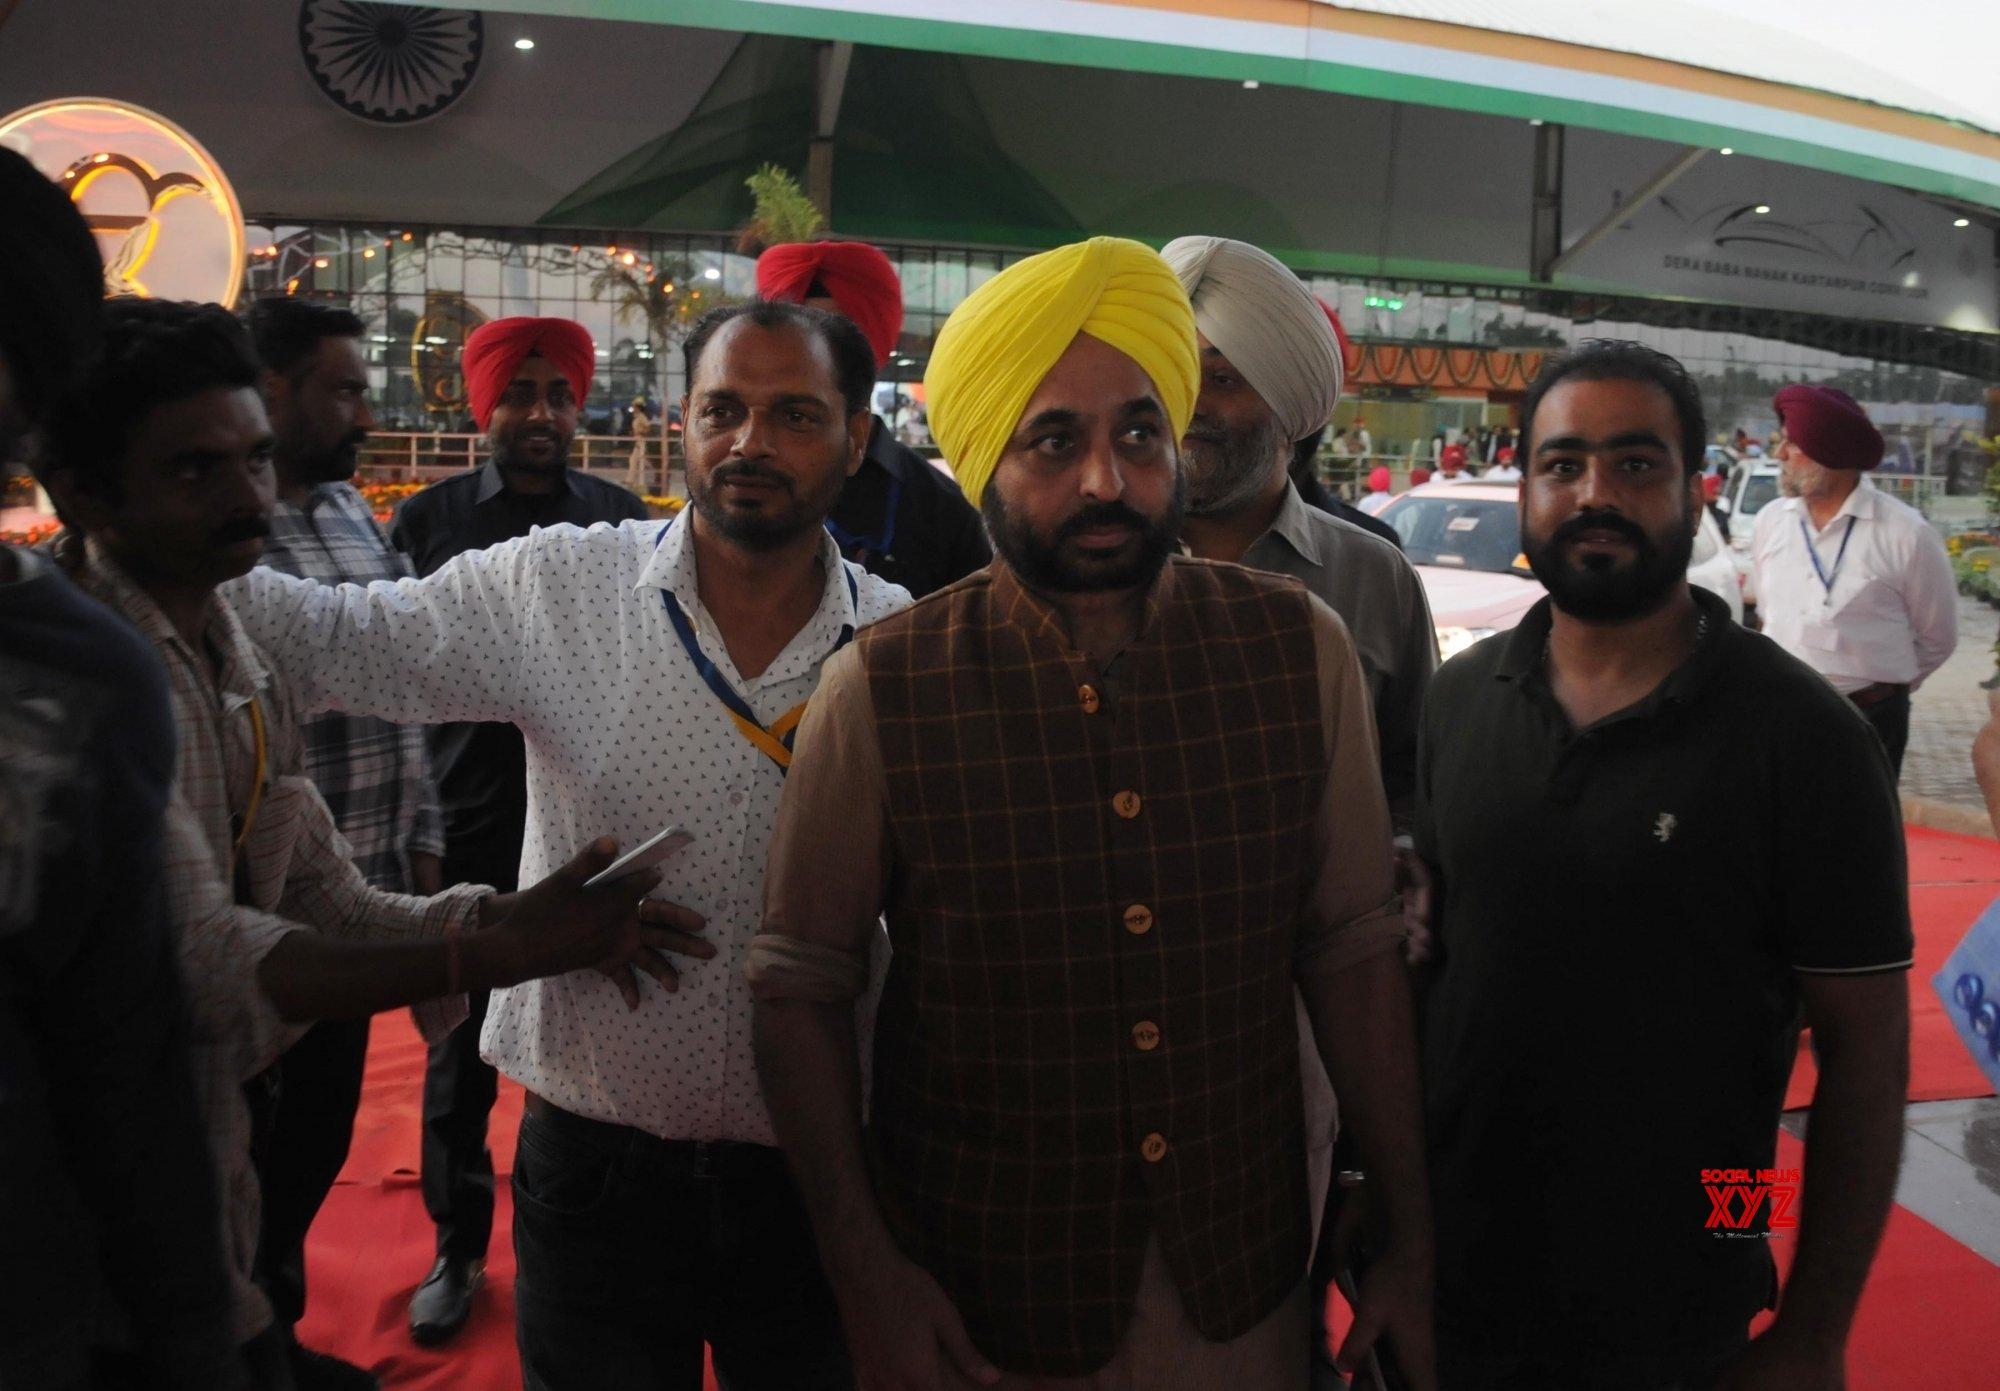 Gurdaspur: Bhagwant Mann at newly inaugurated Integrated Check Post of Kartarpur Corridor in Punjab #Gallery